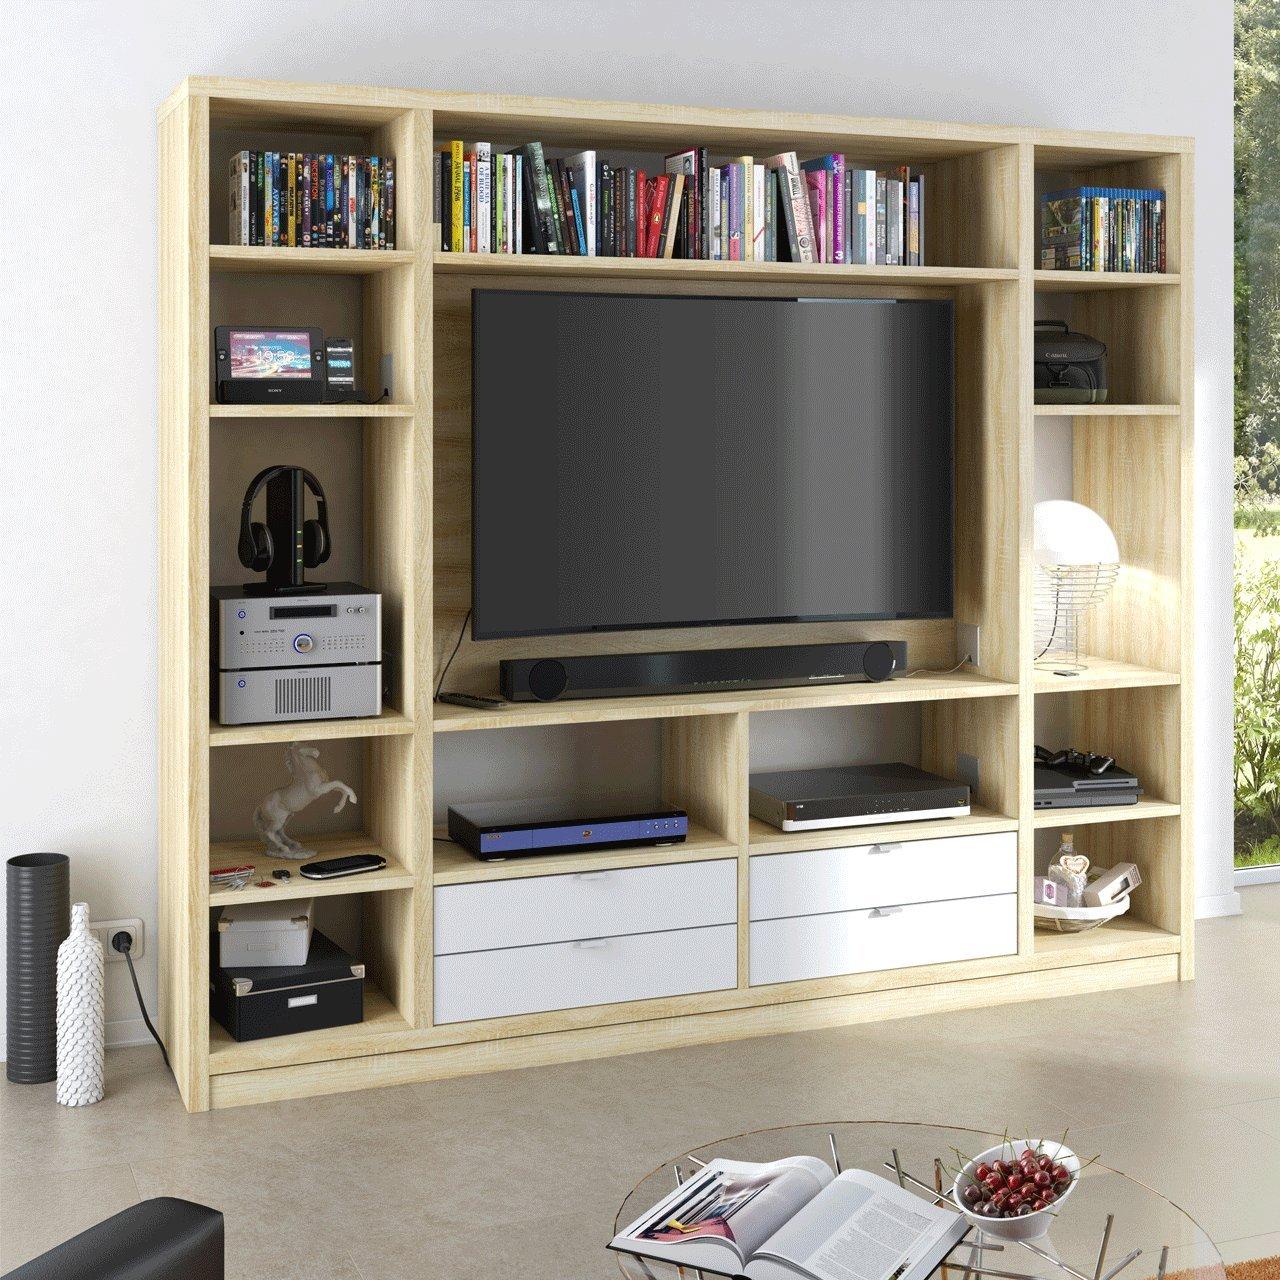 wandregal sonoma eiche affordable wandregal sonoma eiche. Black Bedroom Furniture Sets. Home Design Ideas